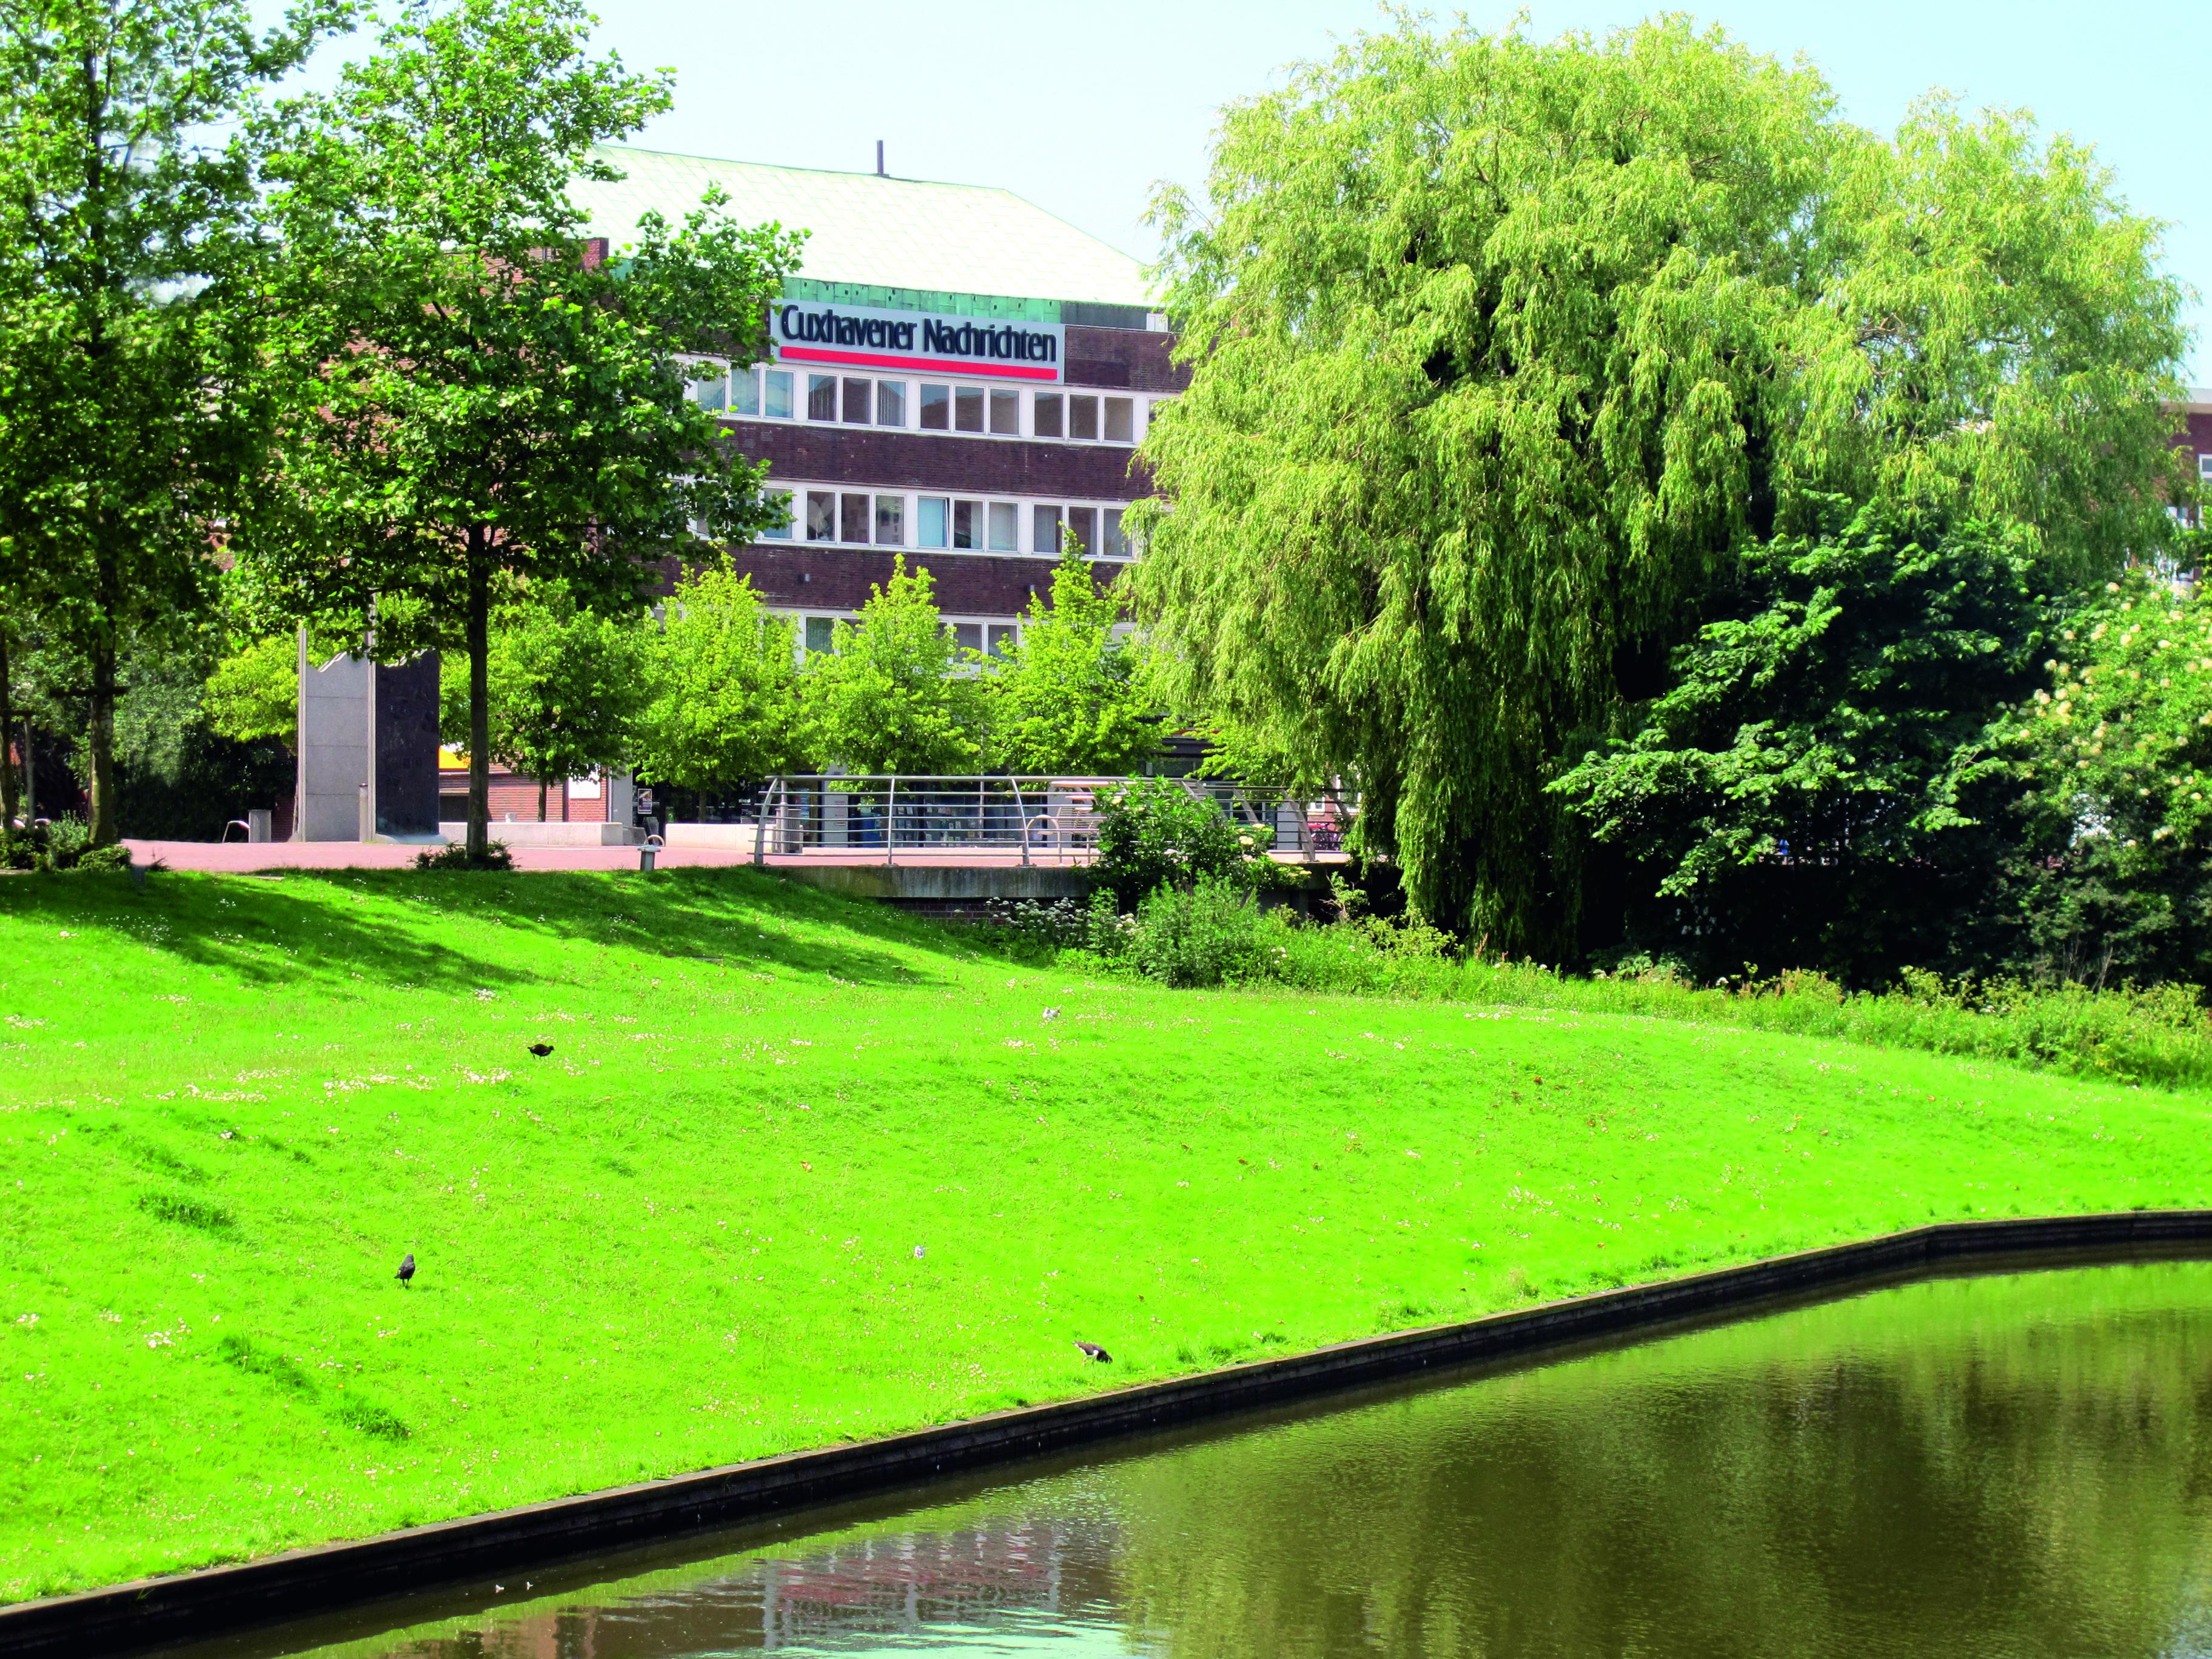 IMG_2075.jpg – Cuxhaven-Niederelbe Verlagsgesellschaft mbH & Co. KG